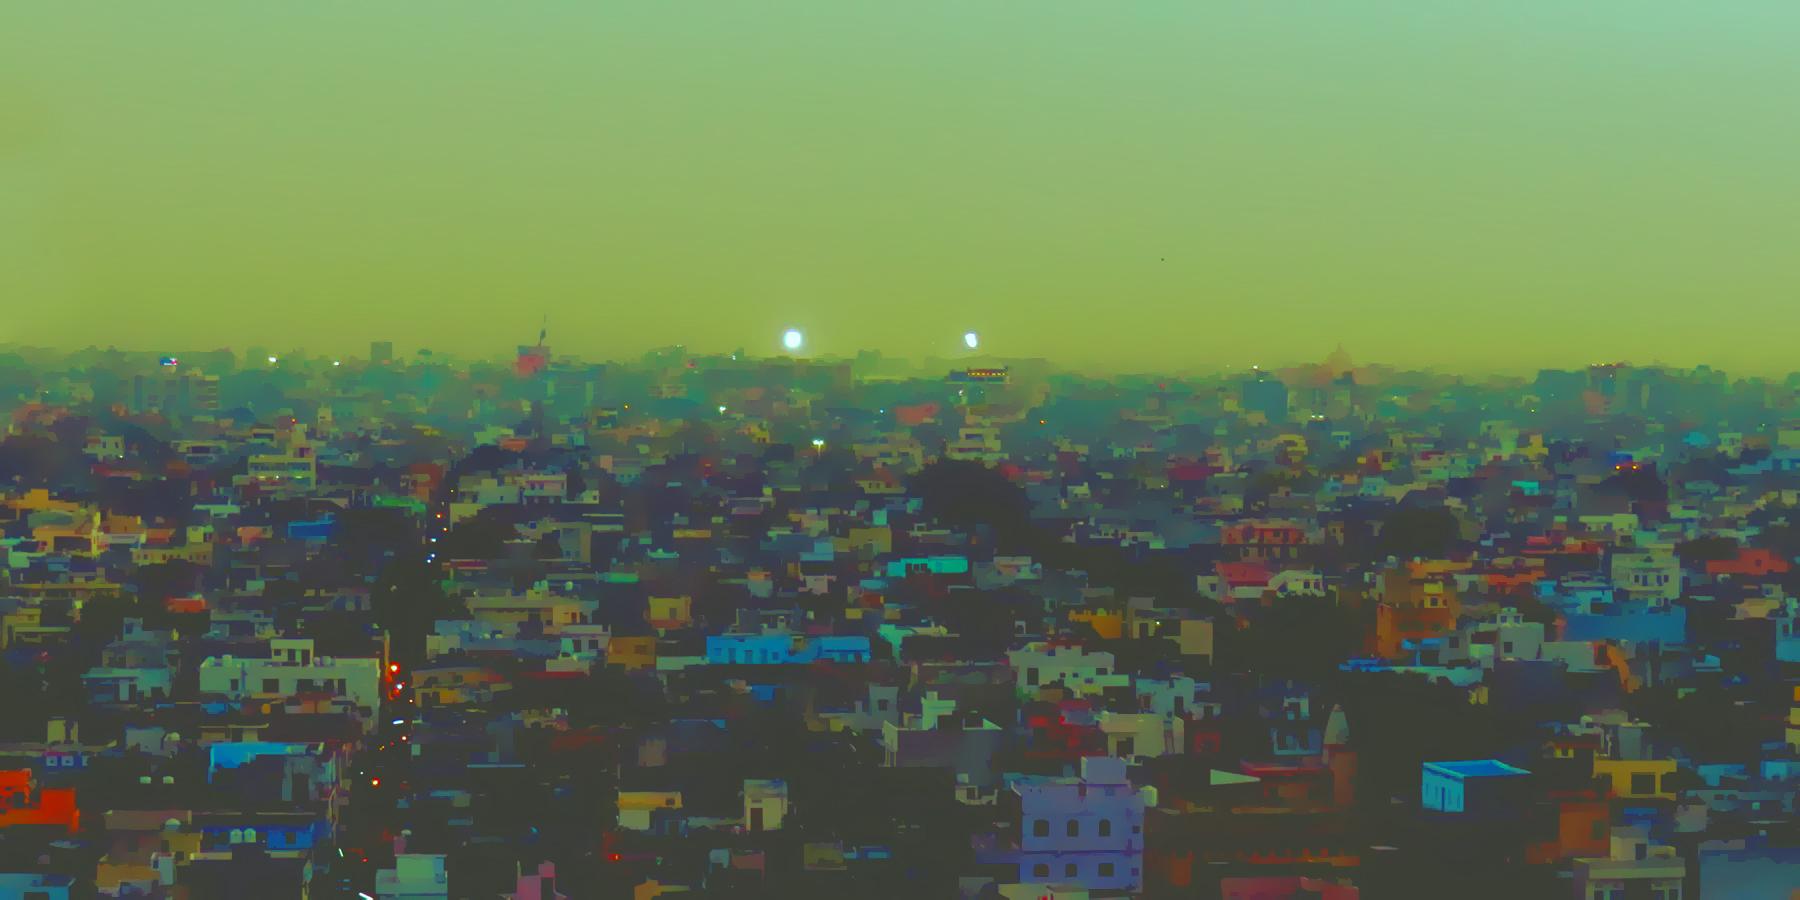 jodhpur cityscape-slum earth-mike strescino-photography-india-cover photo .jpg